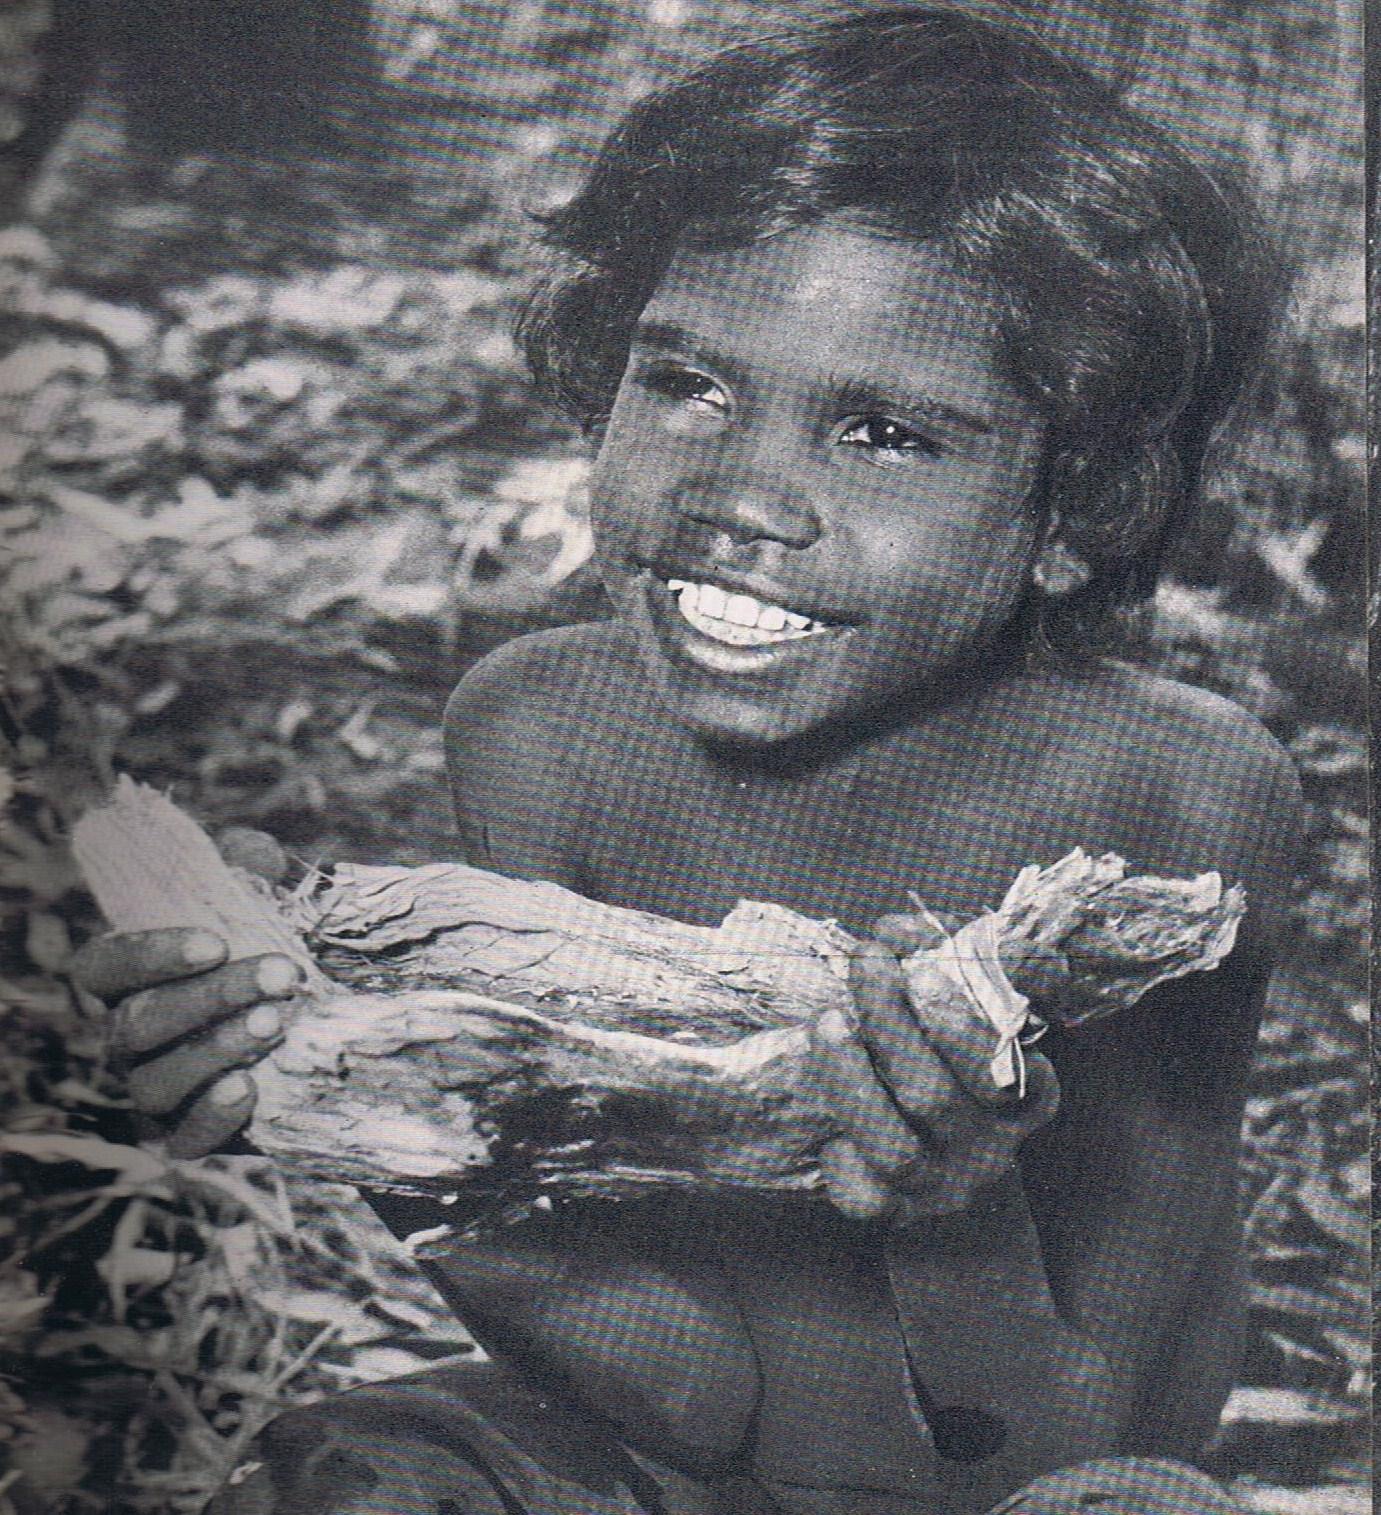 Тетка и племя фото 24 фотография